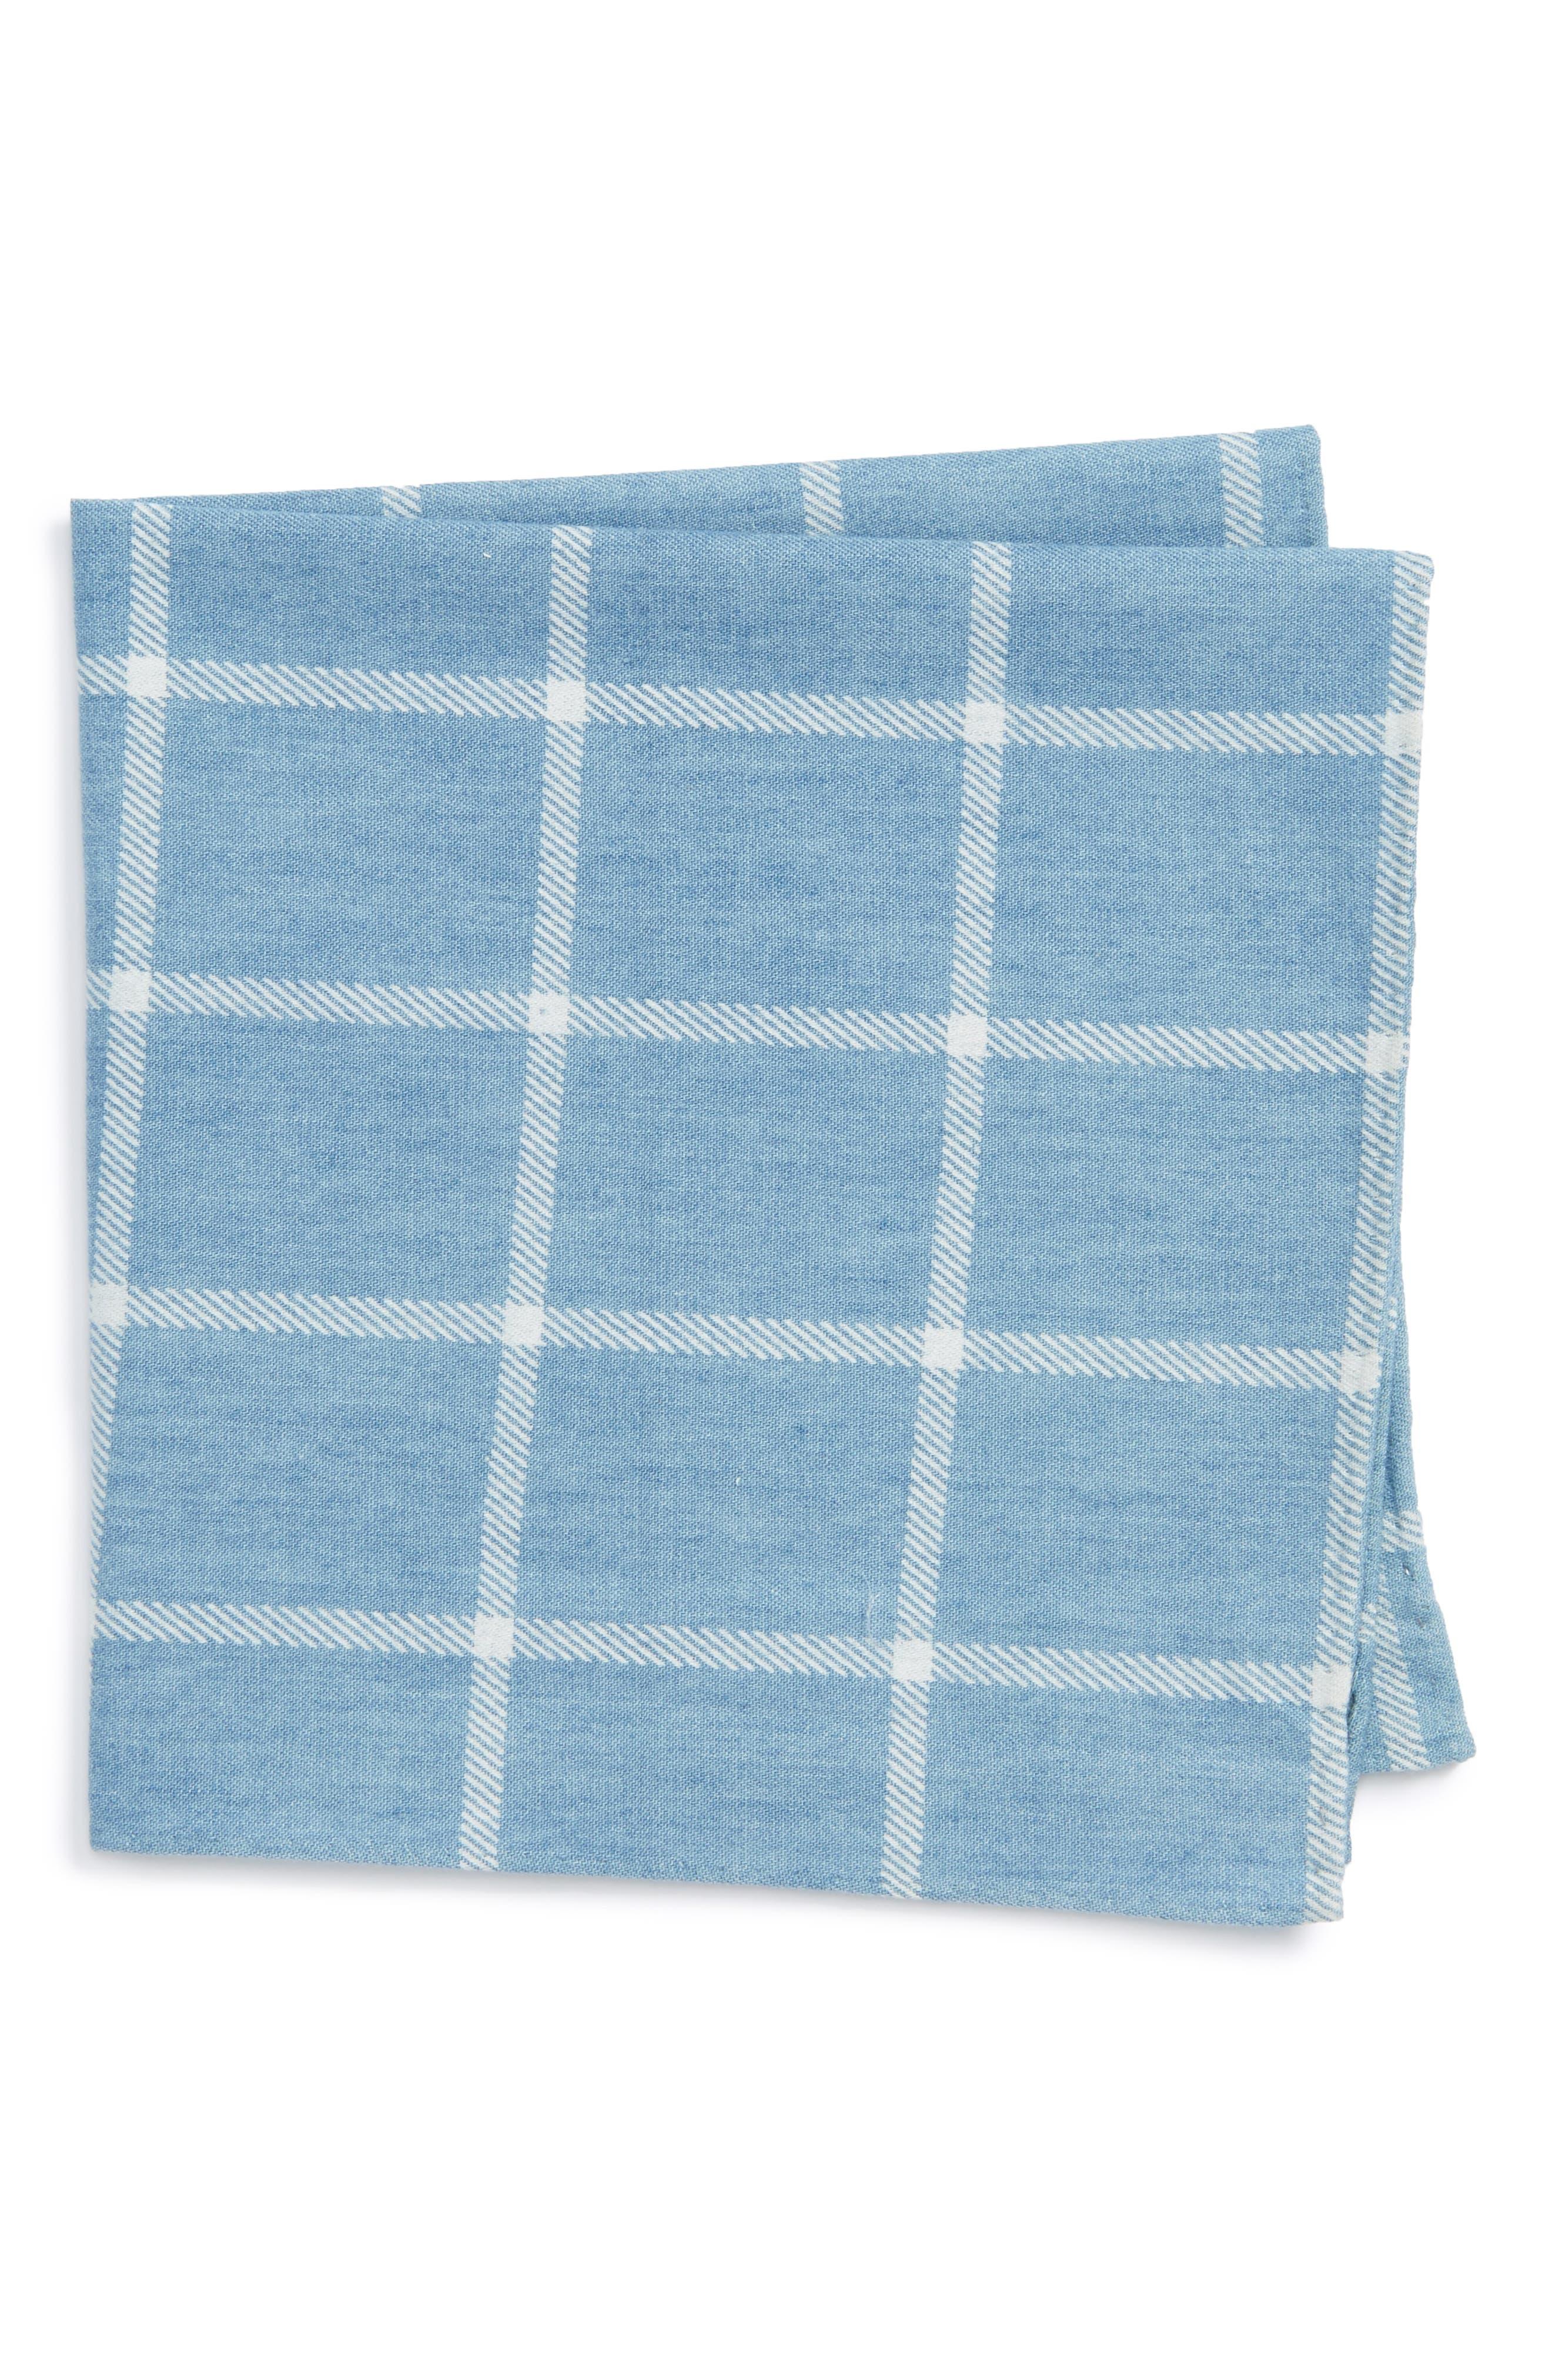 Main Image - Nordstrom Men's Shop Sergi Check Cotton Pocket Square